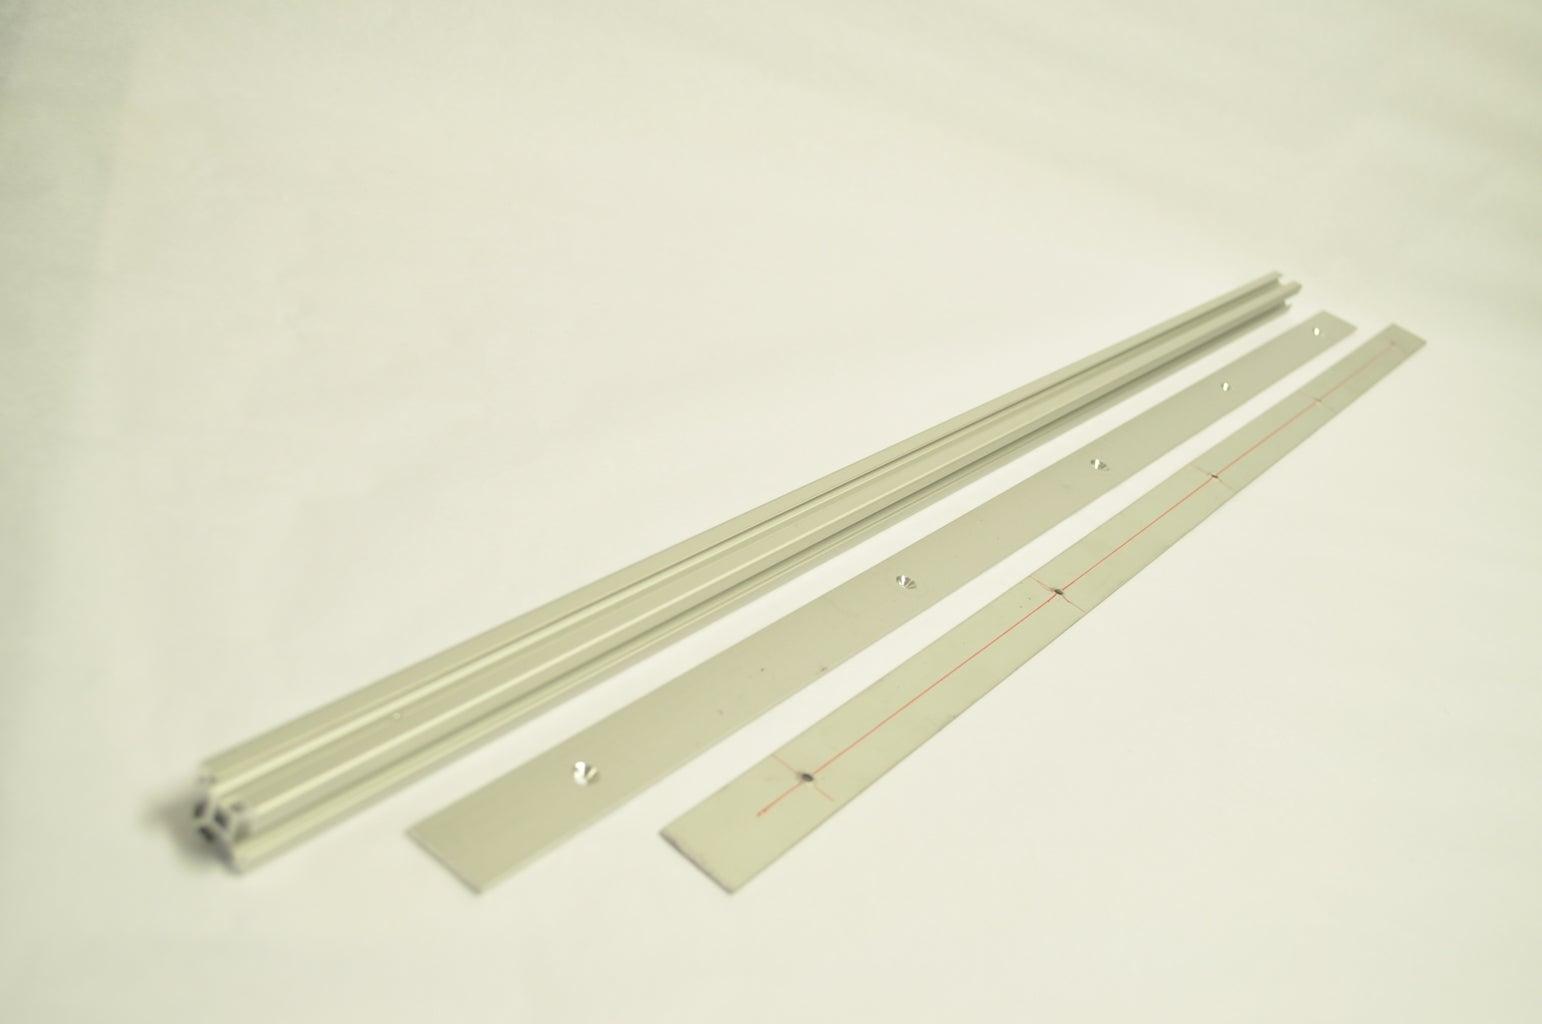 Prepare the Aluminum Strips and T-bars